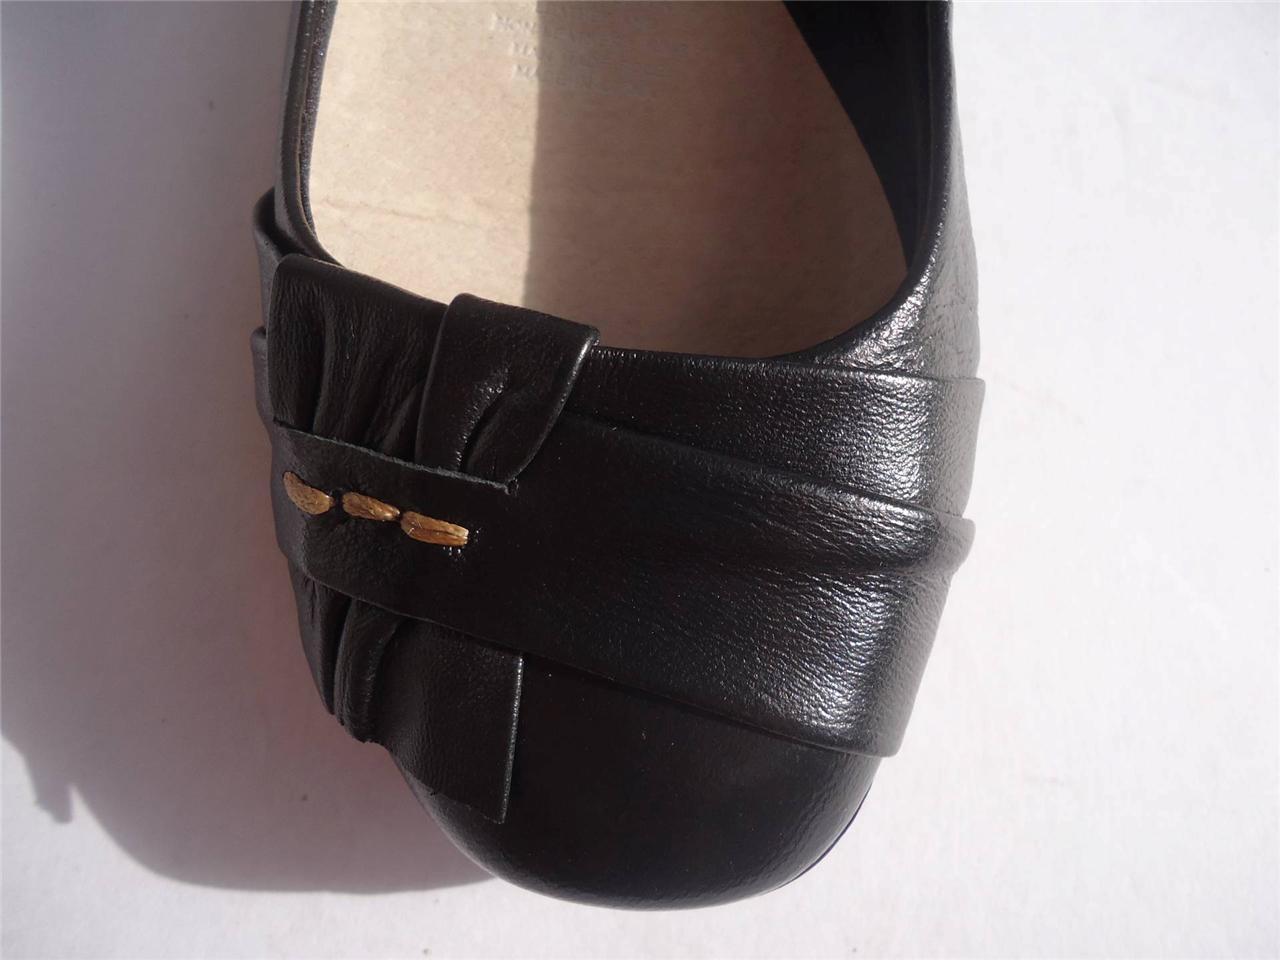 New-Women-Supersoft-Diana-Ferrari-Leather-Shoe-Work-Black-Sz-6-7-8-9-10-11-12